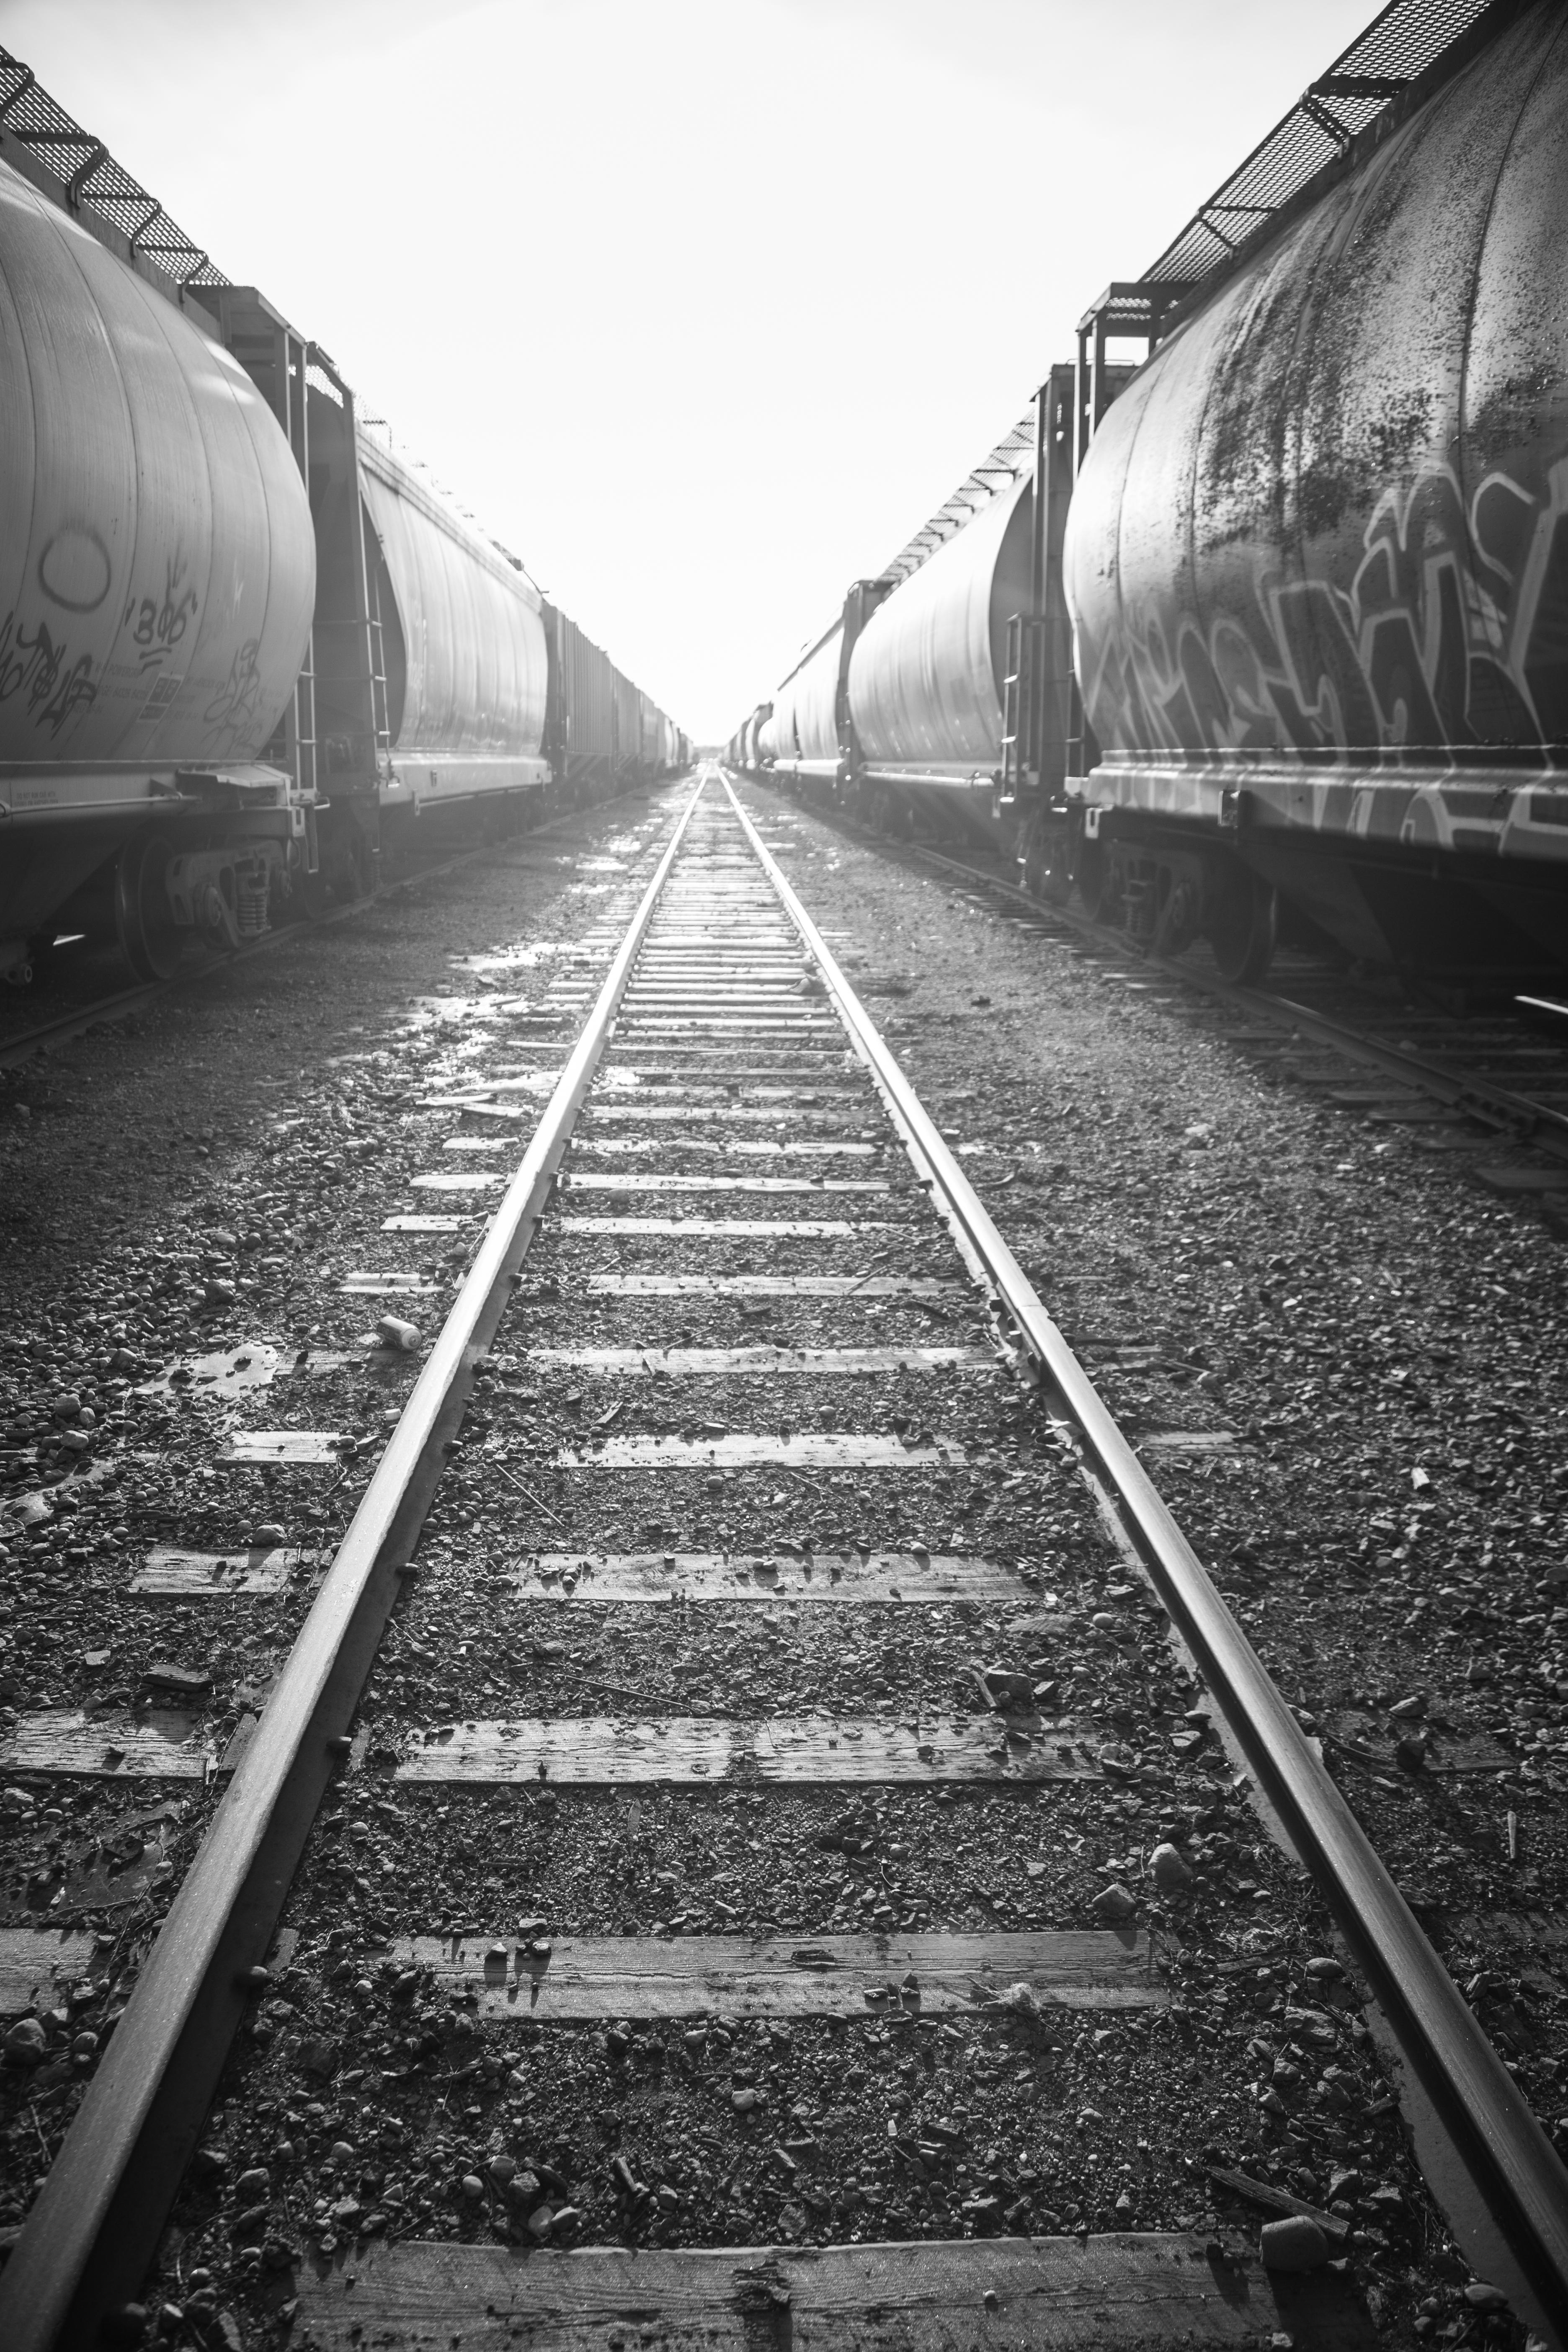 Tracks-16.jpg